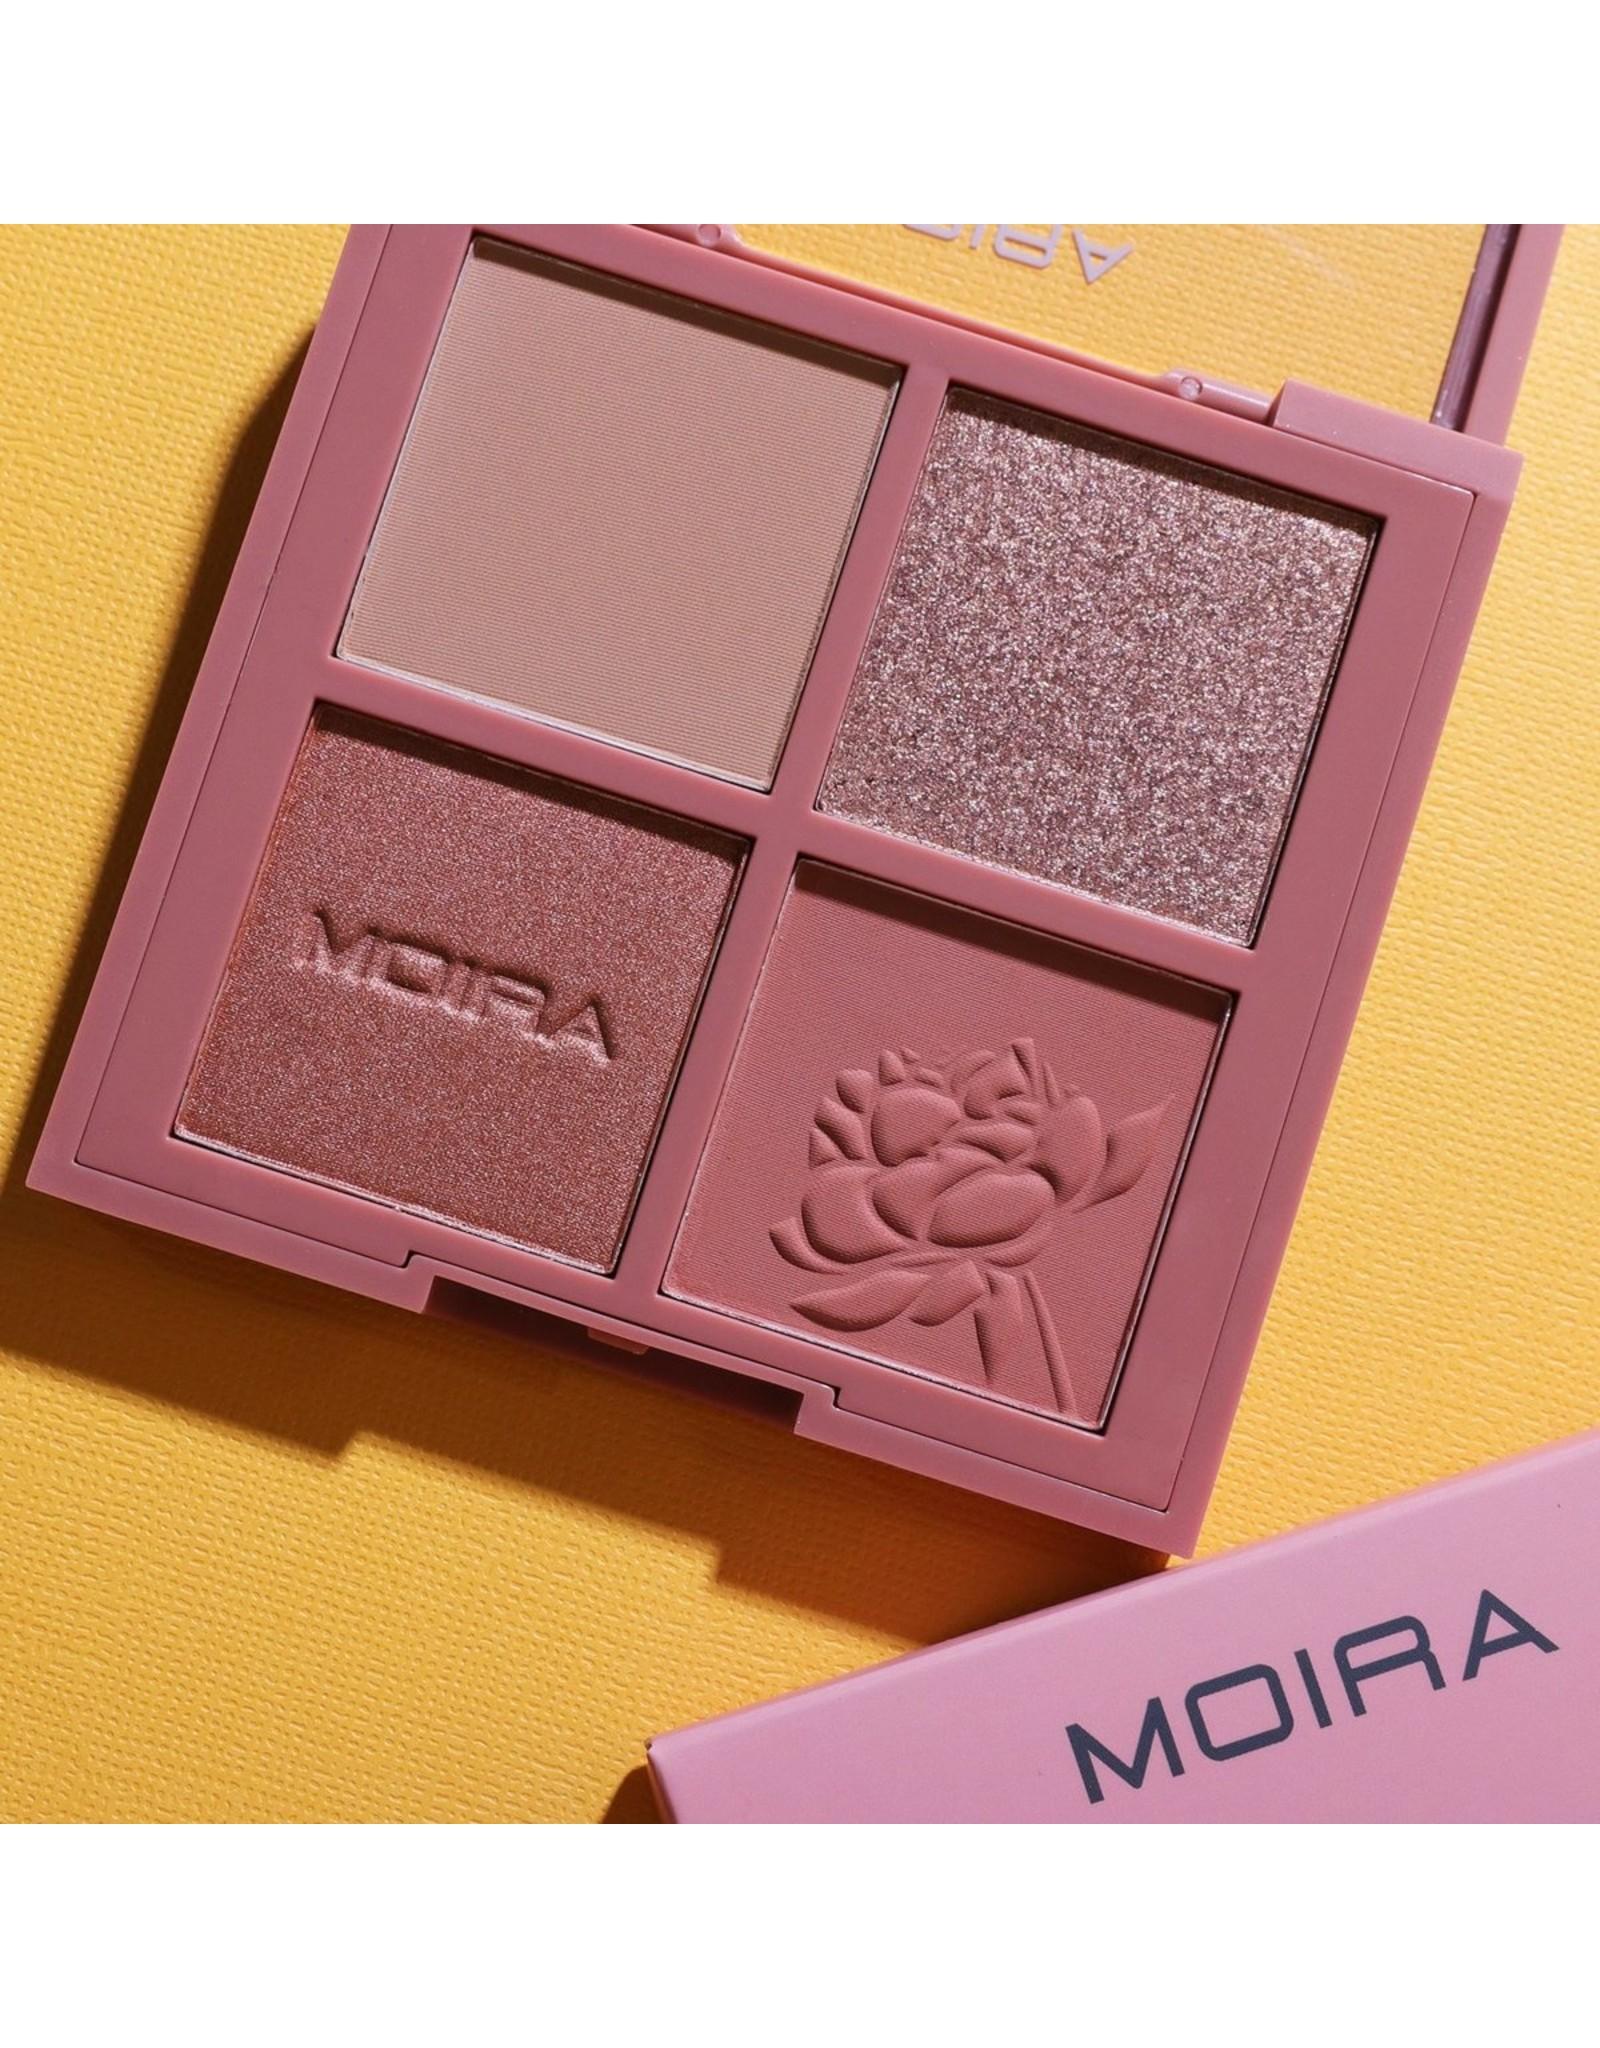 Moira Ready Face Palette 002- Take Notice